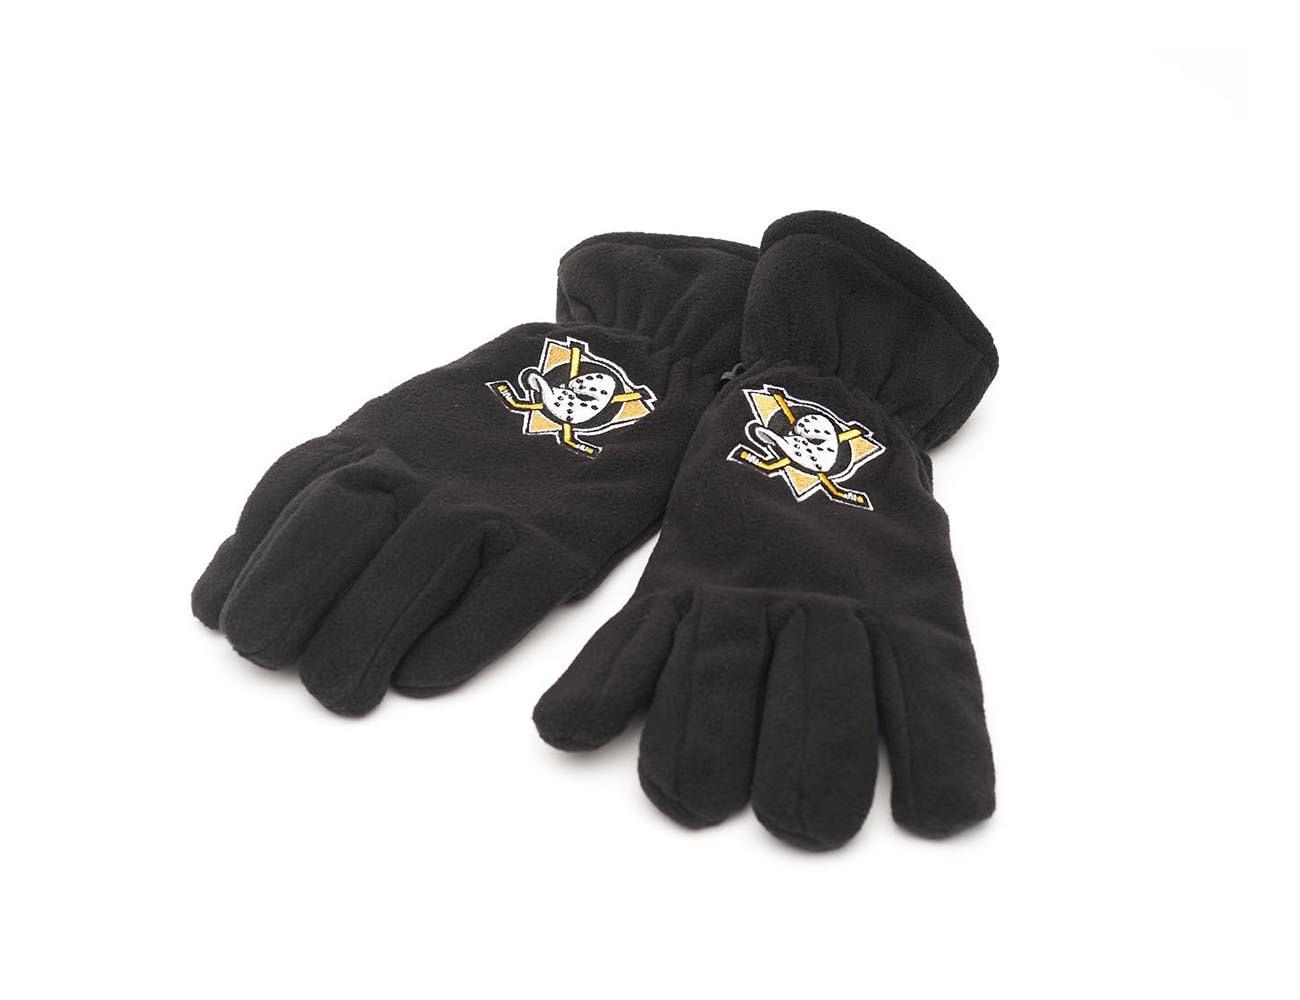 Перчатки NHL Anaheim Ducks (подростковые)